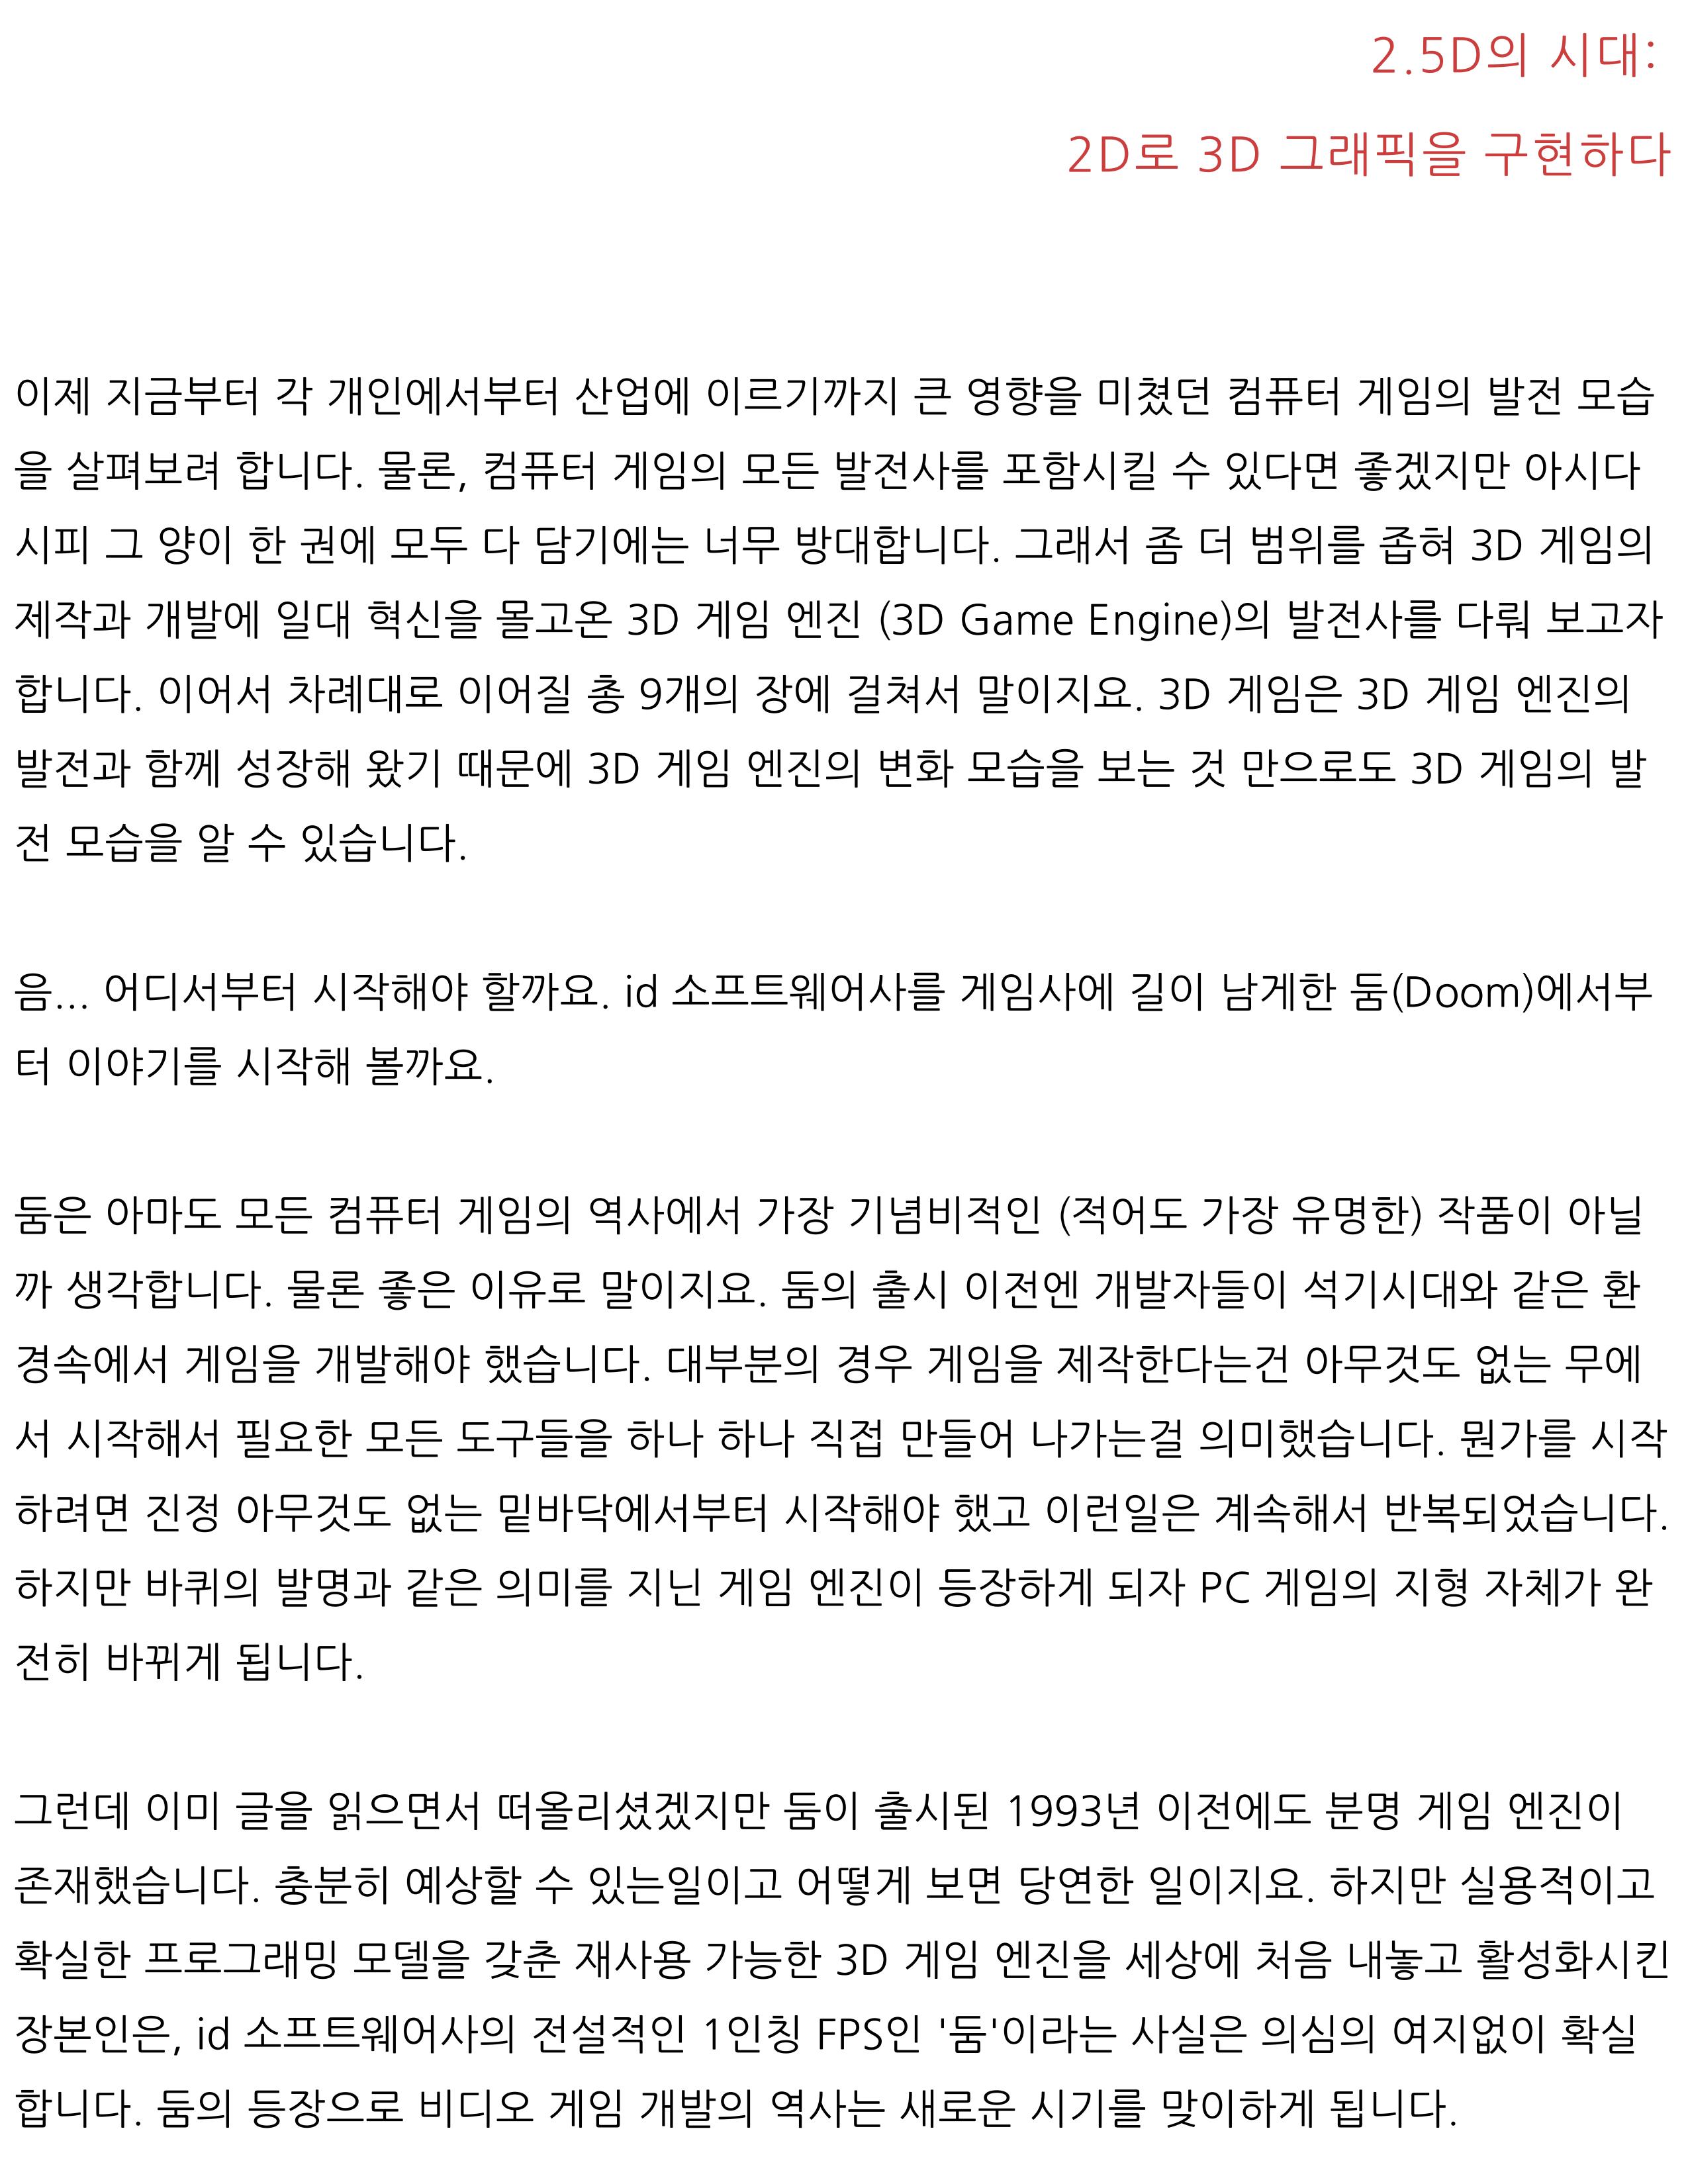 3D geim enjin, eoddeohge baljeo - jeonhyeonseog_07